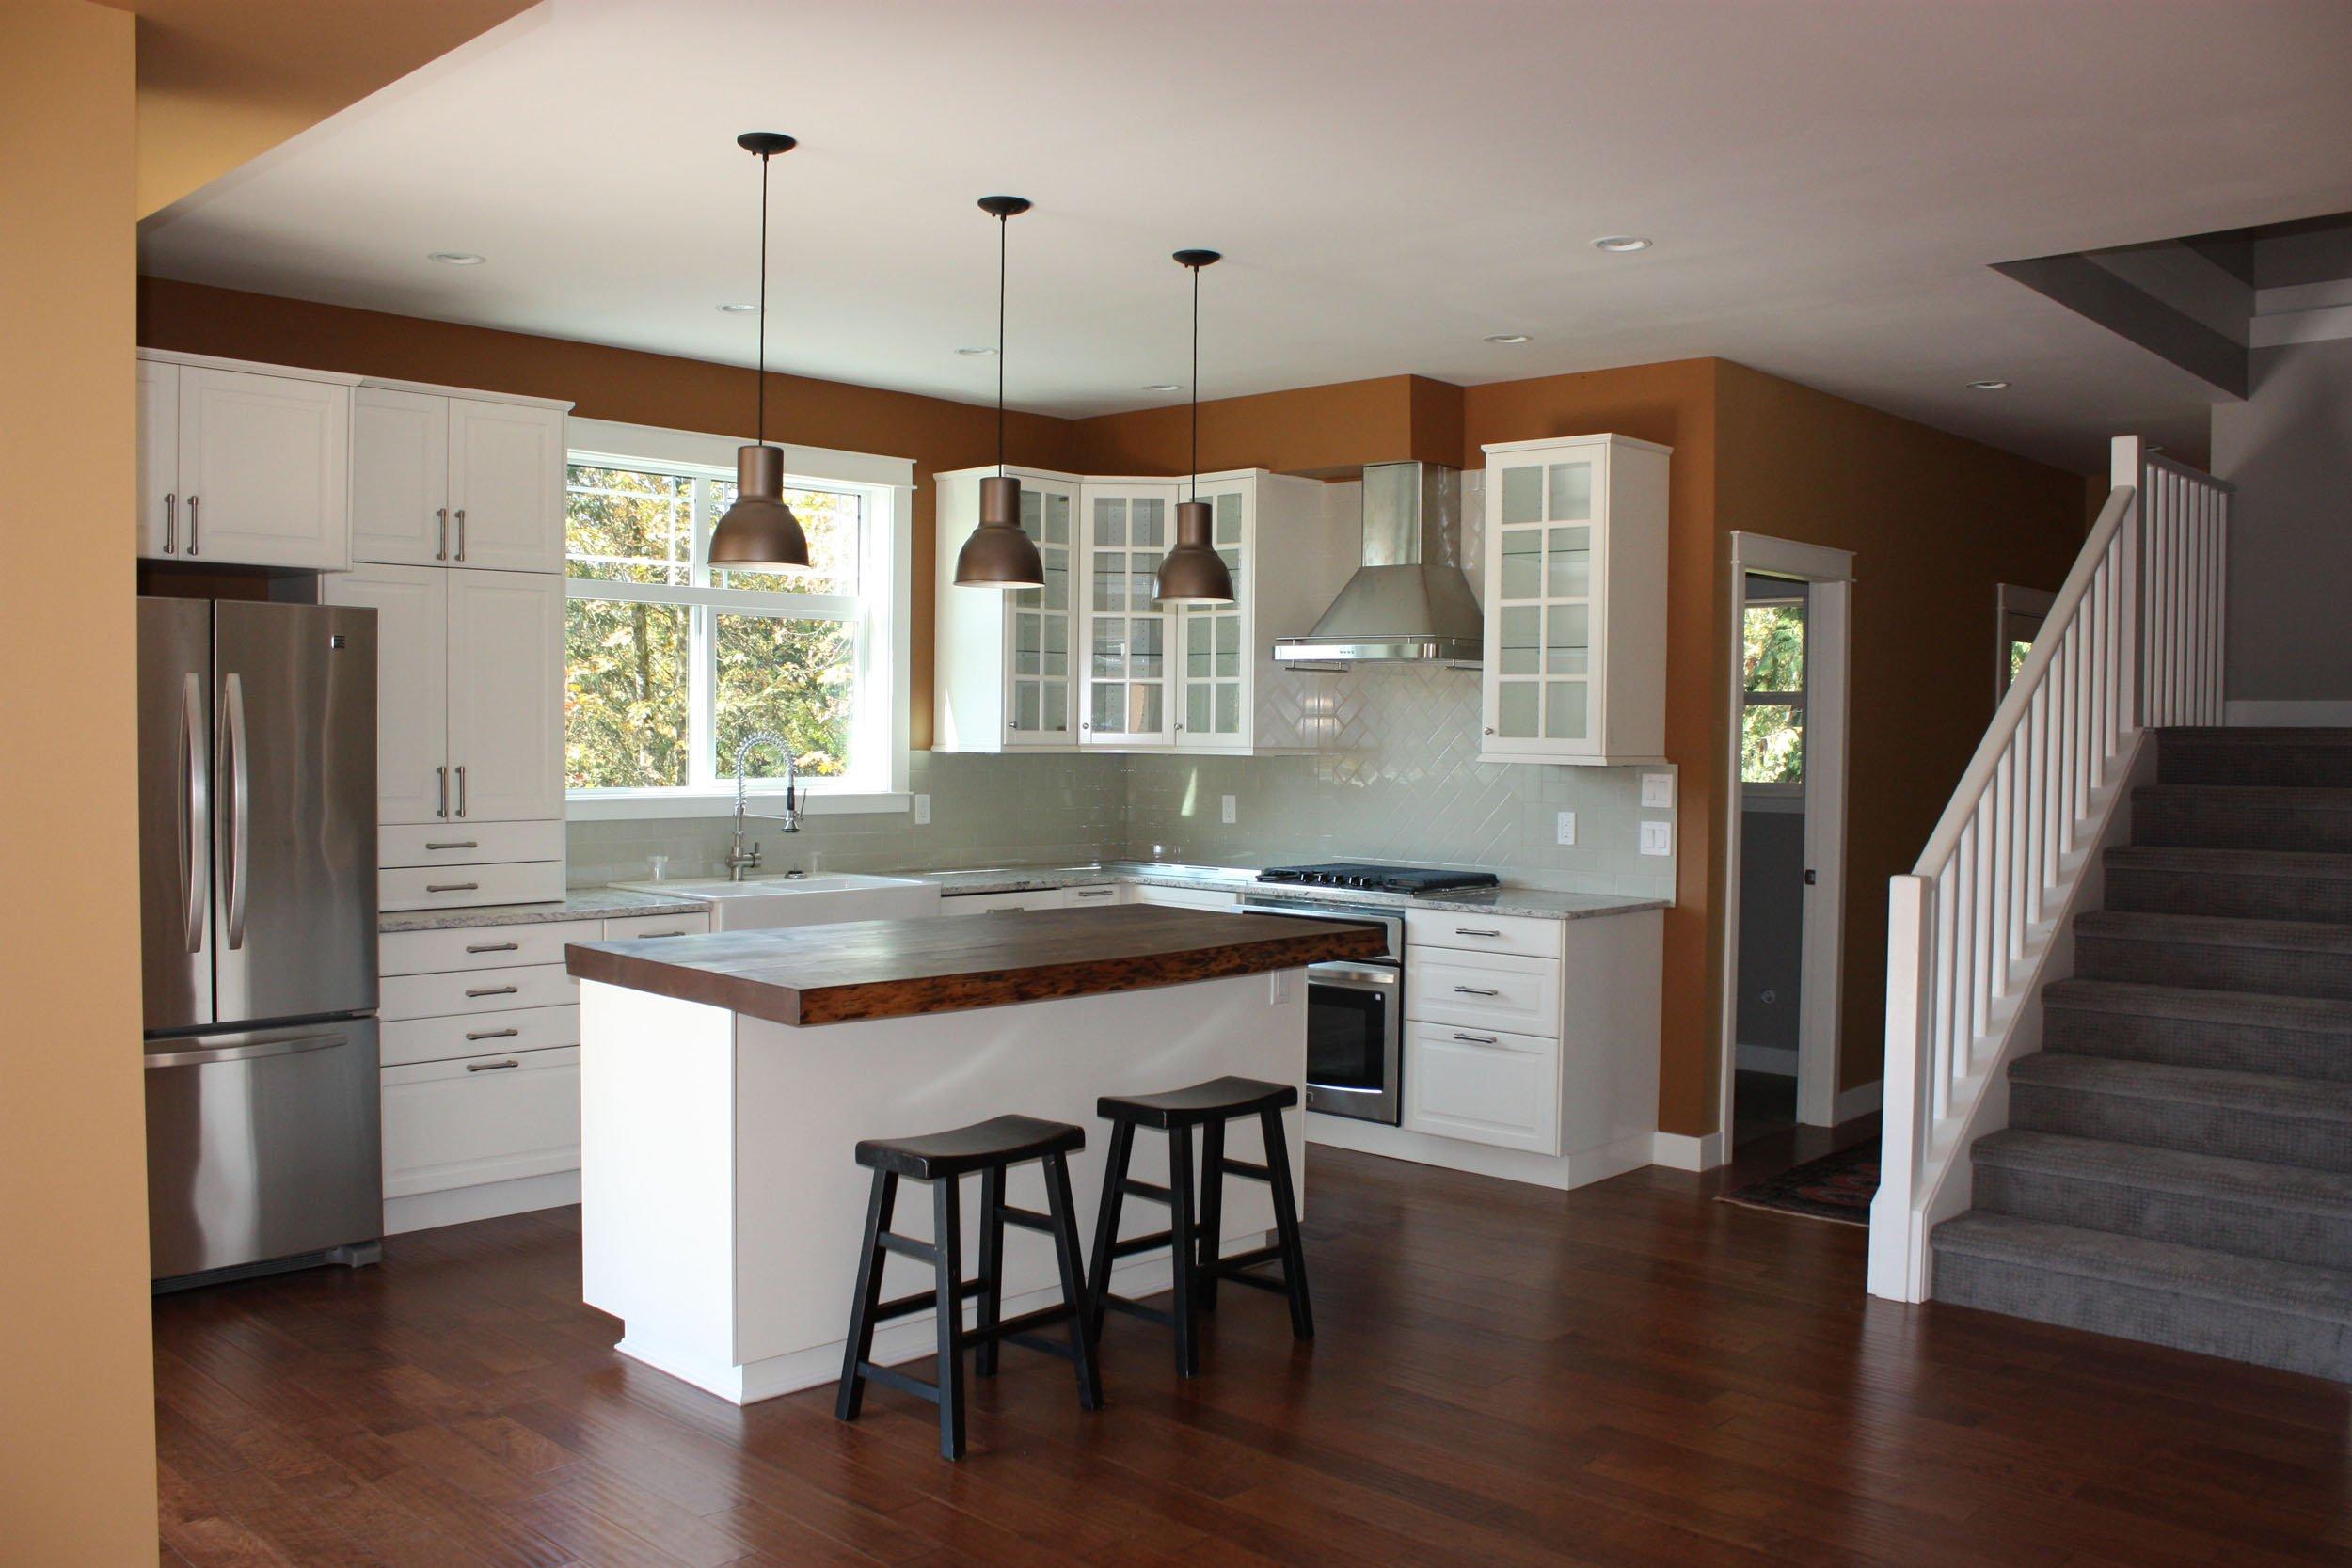 Craftsman Home - Tina Moizer - Custom Closets and Cabinets Hunter Douglas Blinds